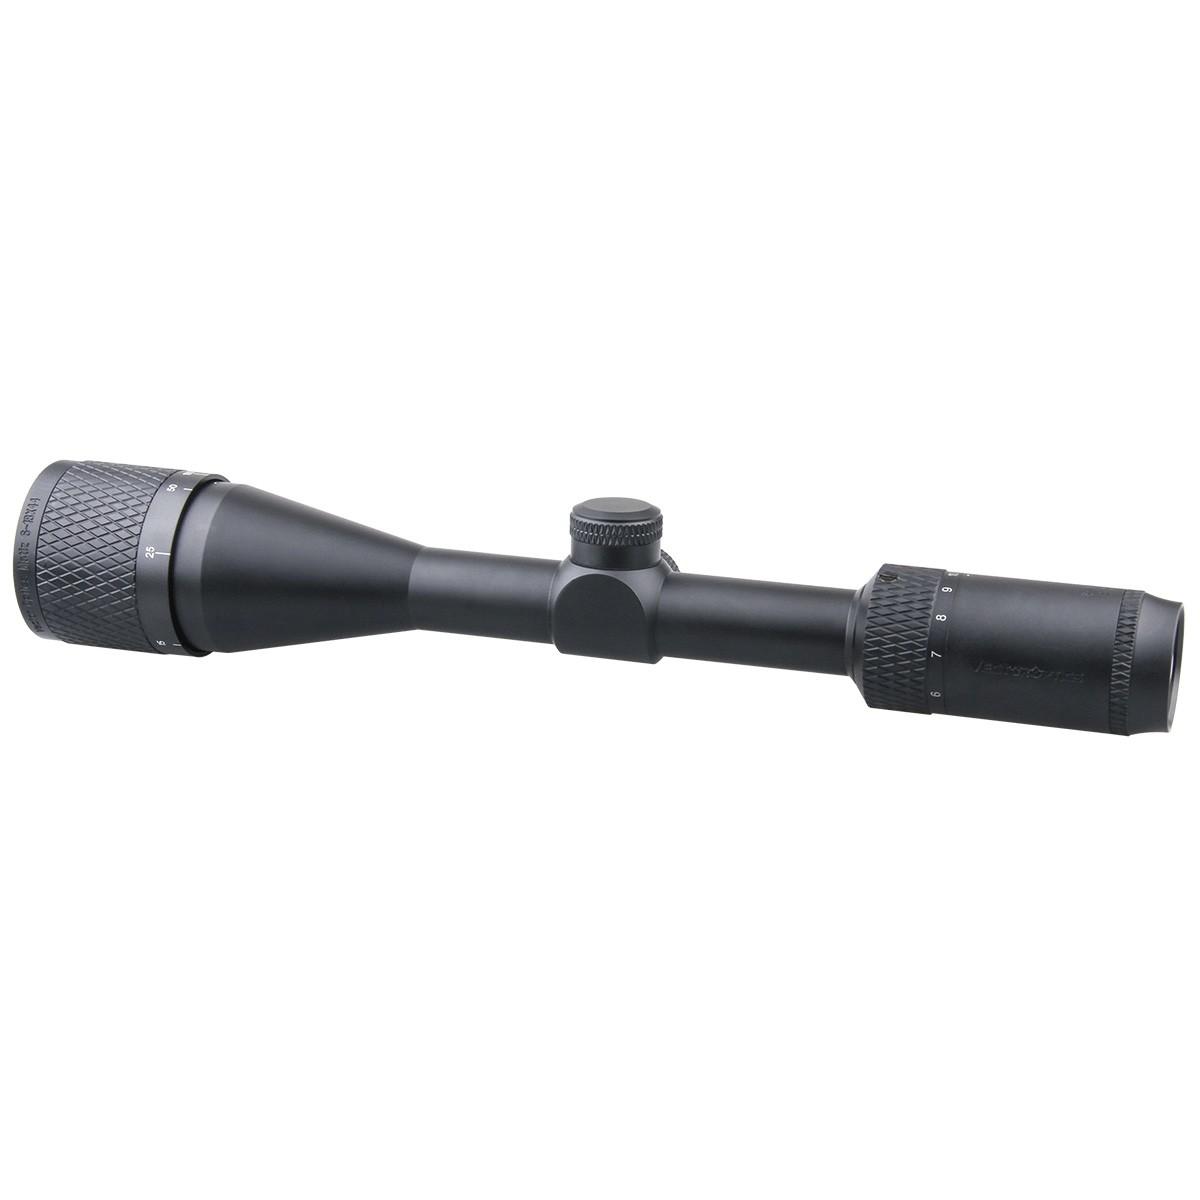 Matiz 6-18x44SFP Riflescope